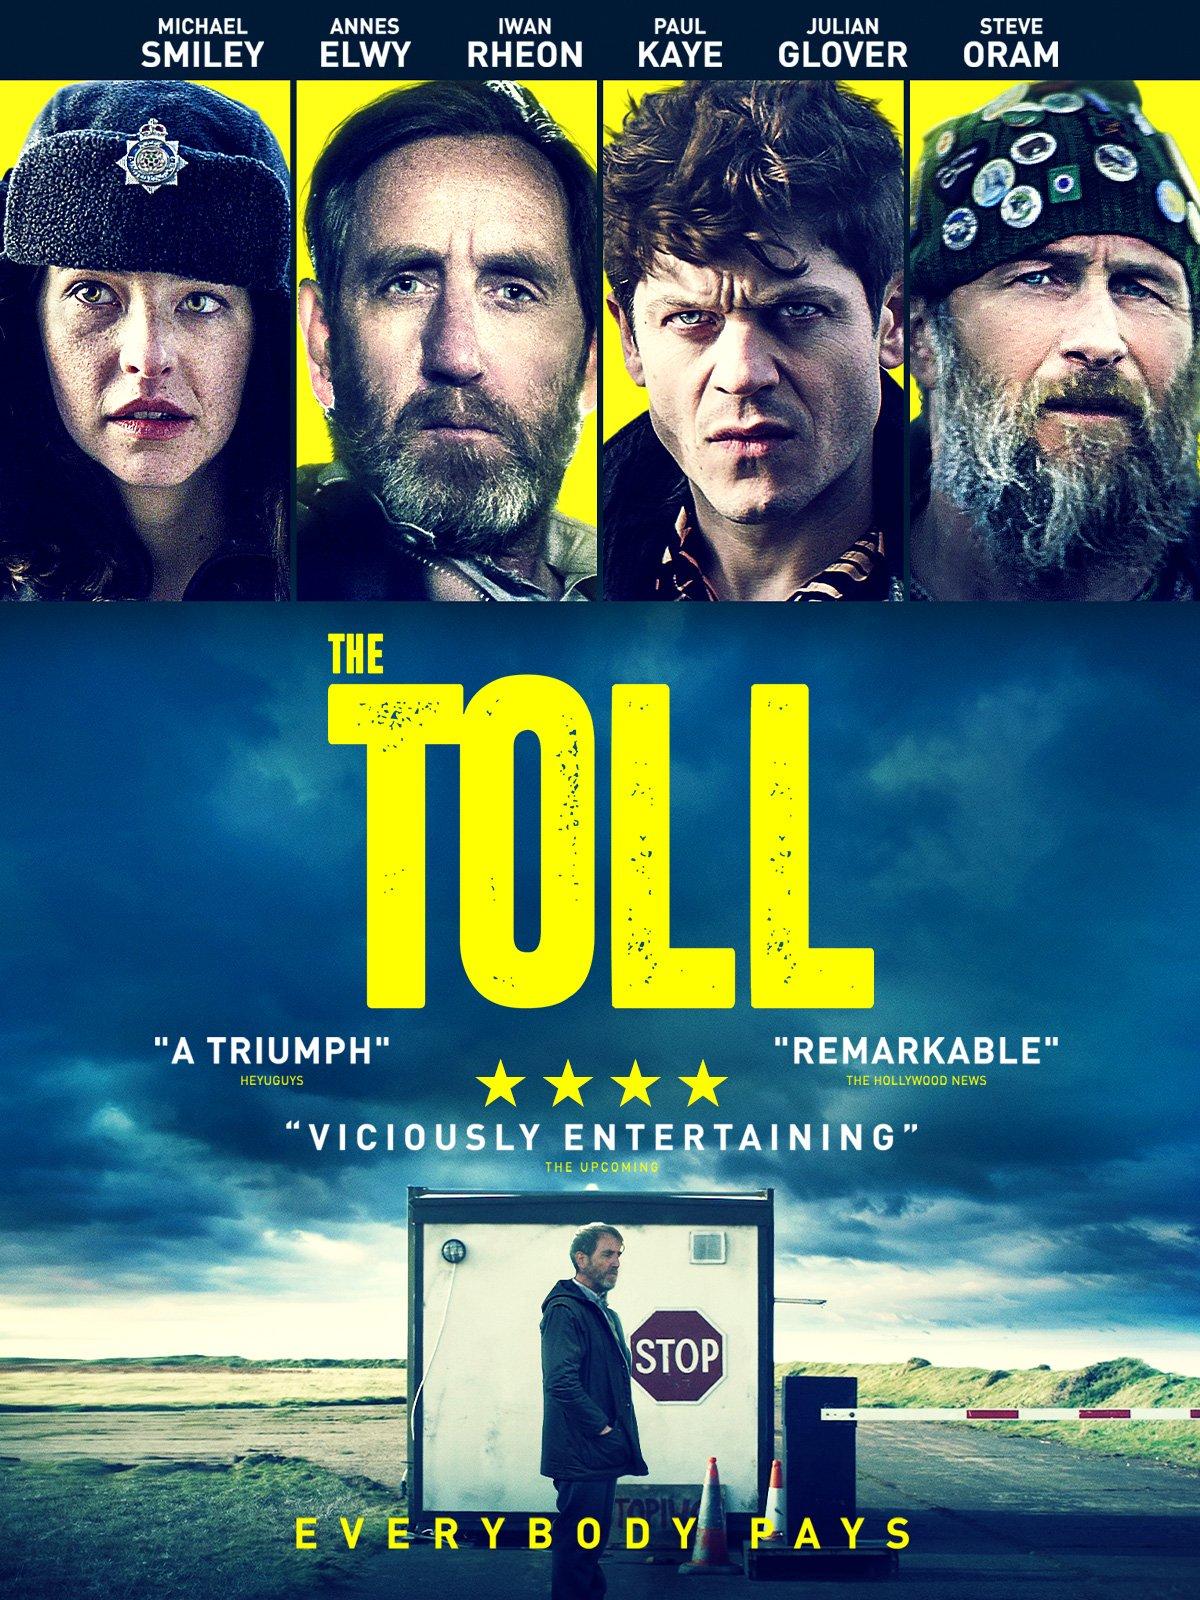 THE_TOLL_Artwork_Portait